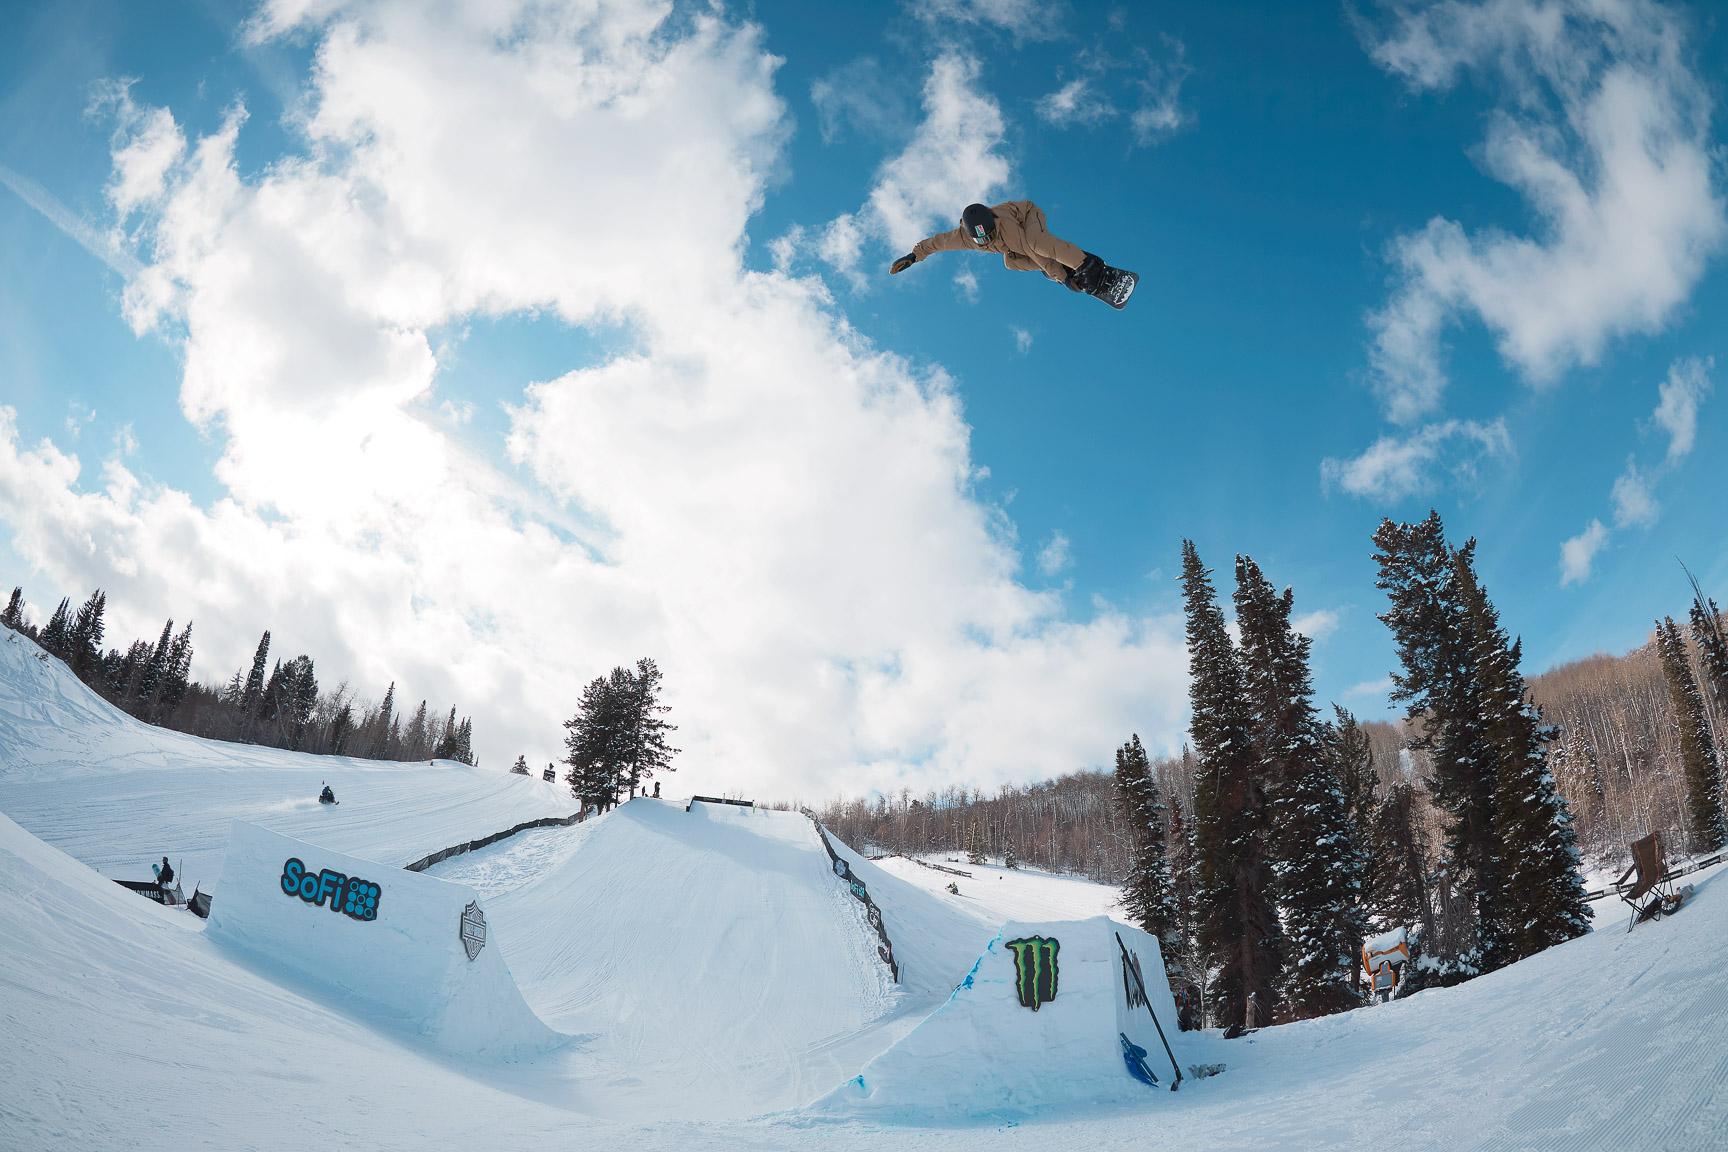 Red Gerard, Men's Snowboard Slopestyle Practice